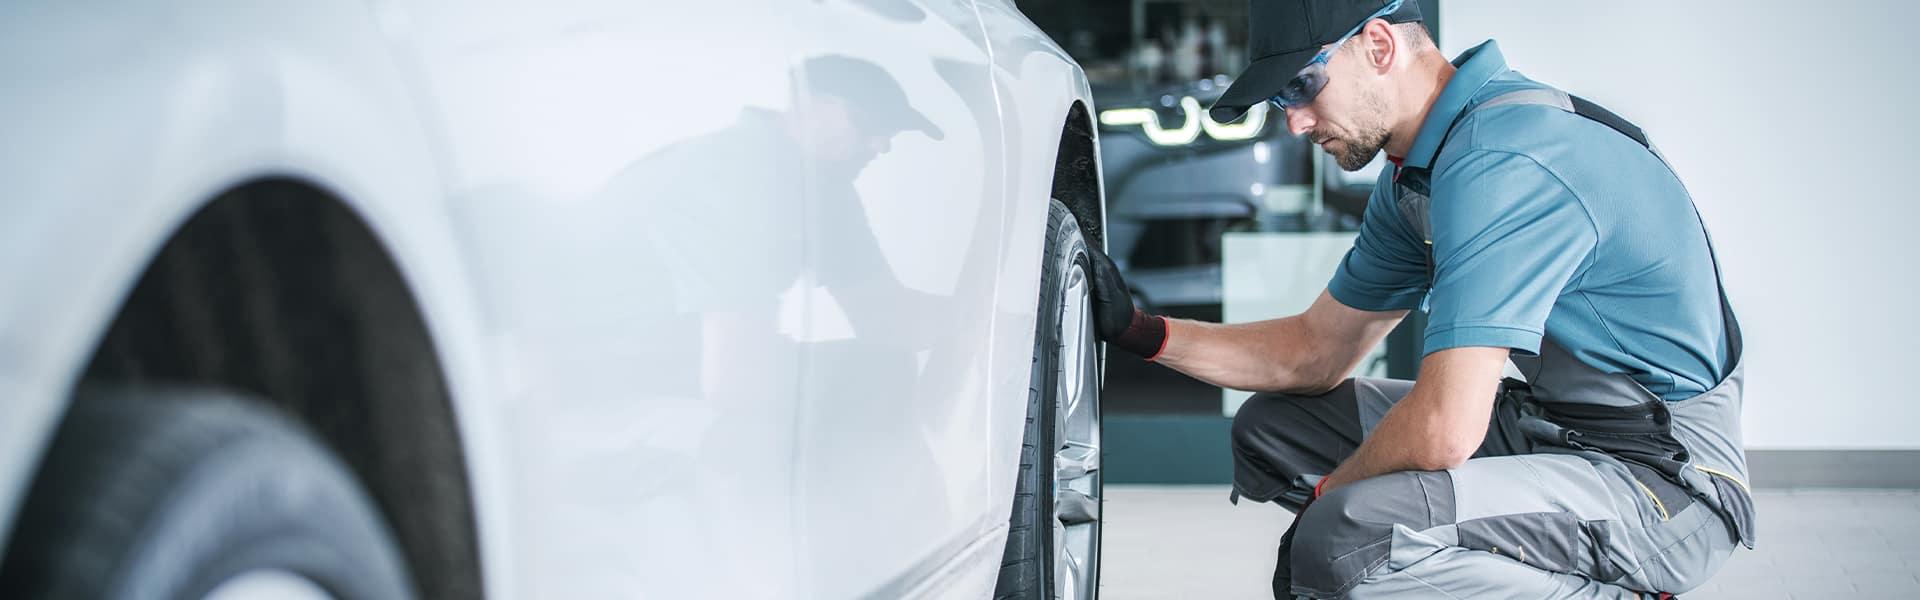 Bennett INFINITI of Wilkes-Barre is a Car Dealership near Scranton PA | Service Advisor Changing Tire on Vehicle